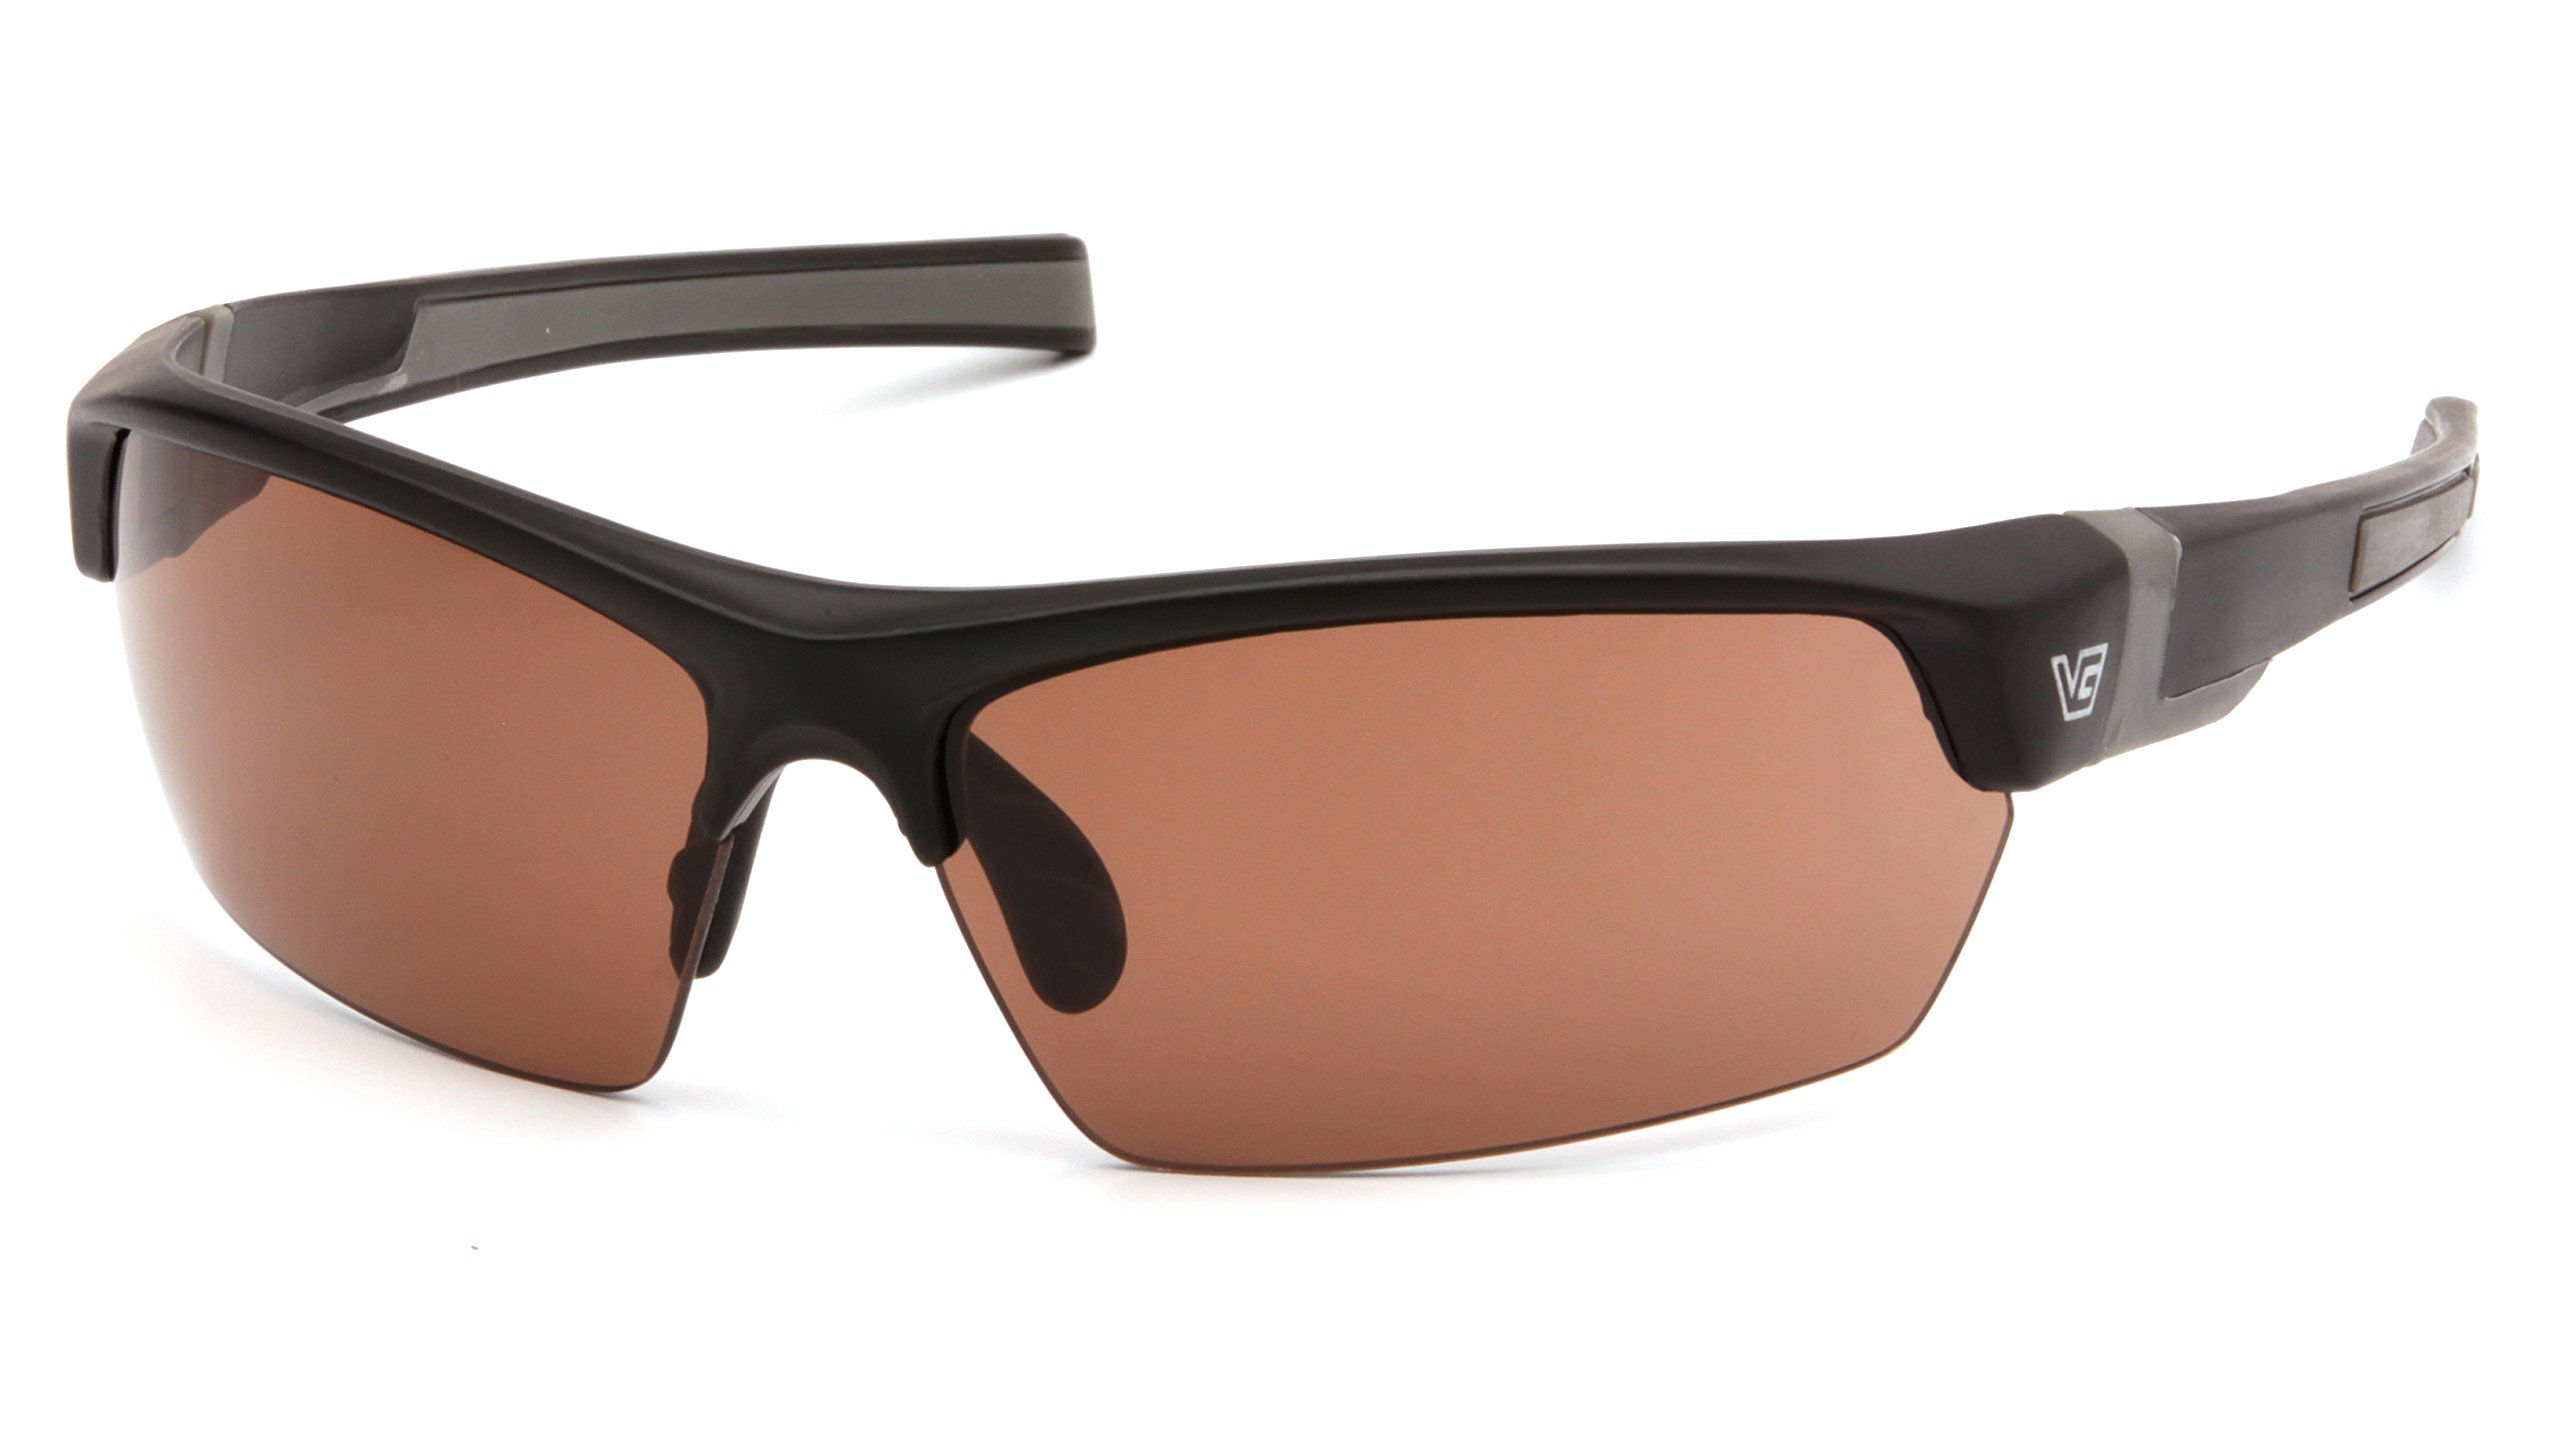 Venture Gear Tensaw Half-Frame High Performance Safety Eyewear, Black Frame, Bronze Anti-Fog Lens